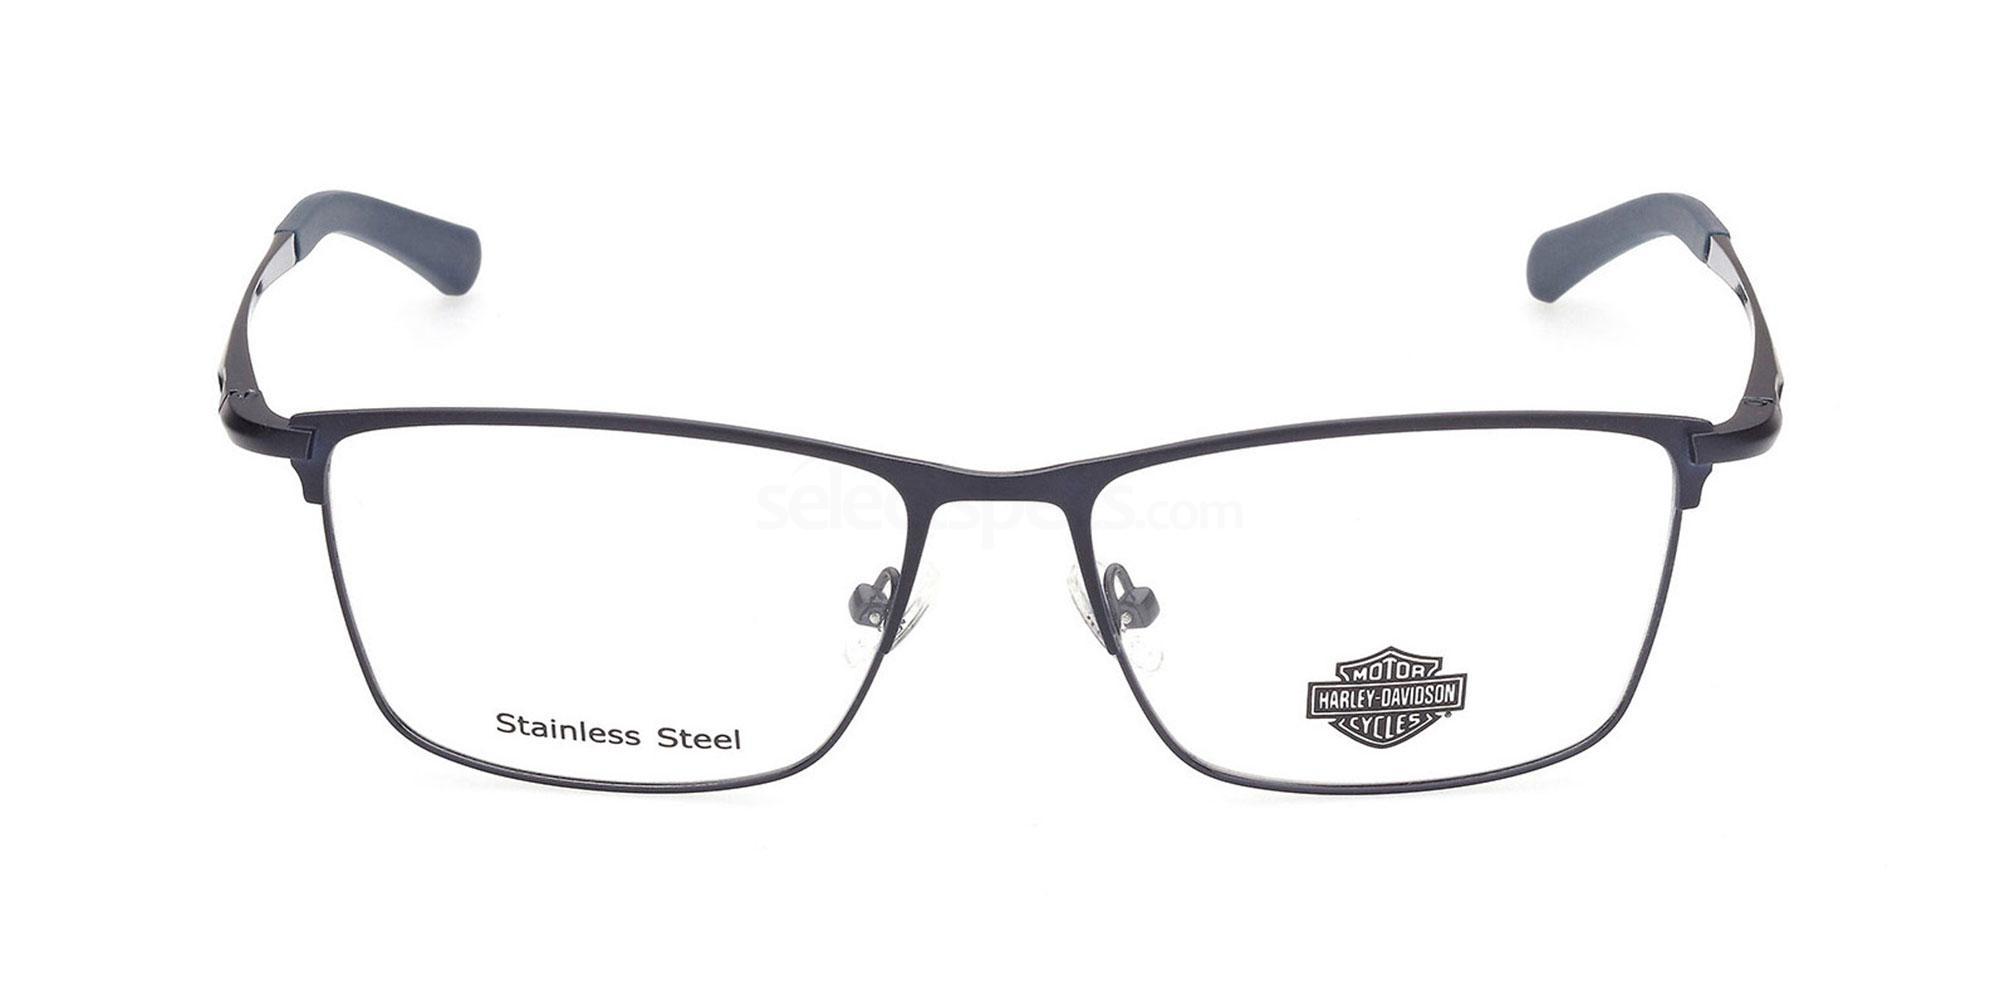 091 HD0821 Glasses, Harley Davidson